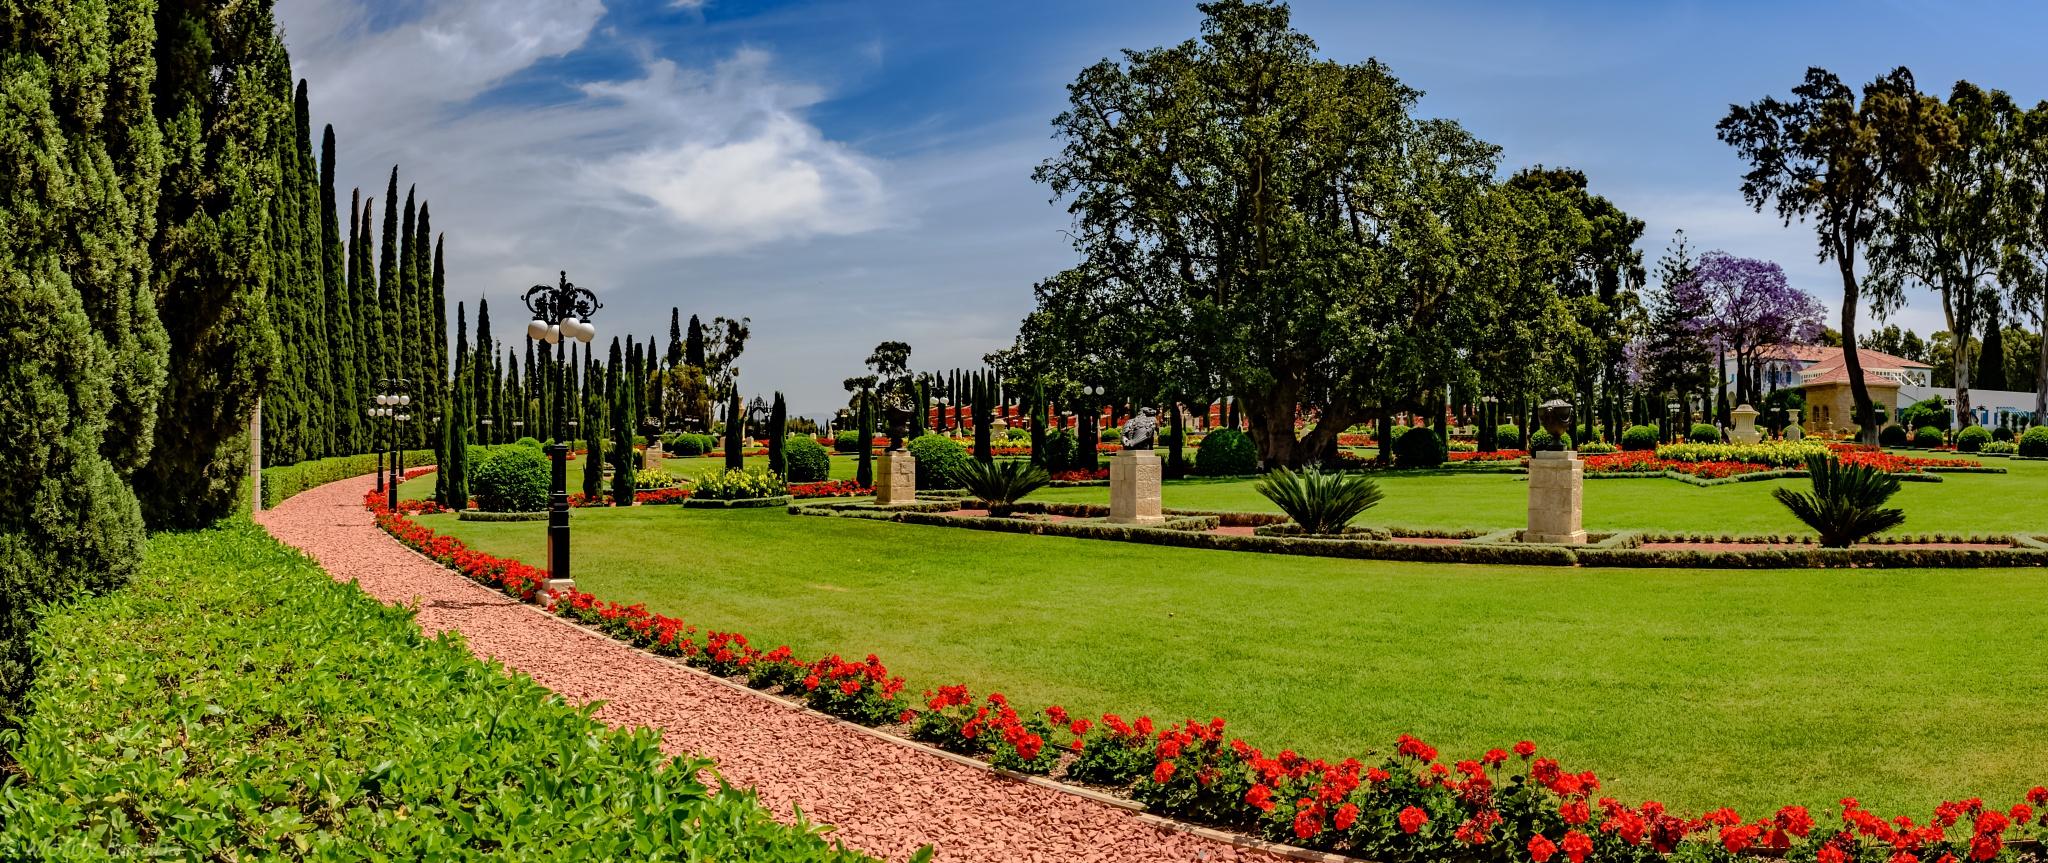 Bahai garden by Mordy Beraha